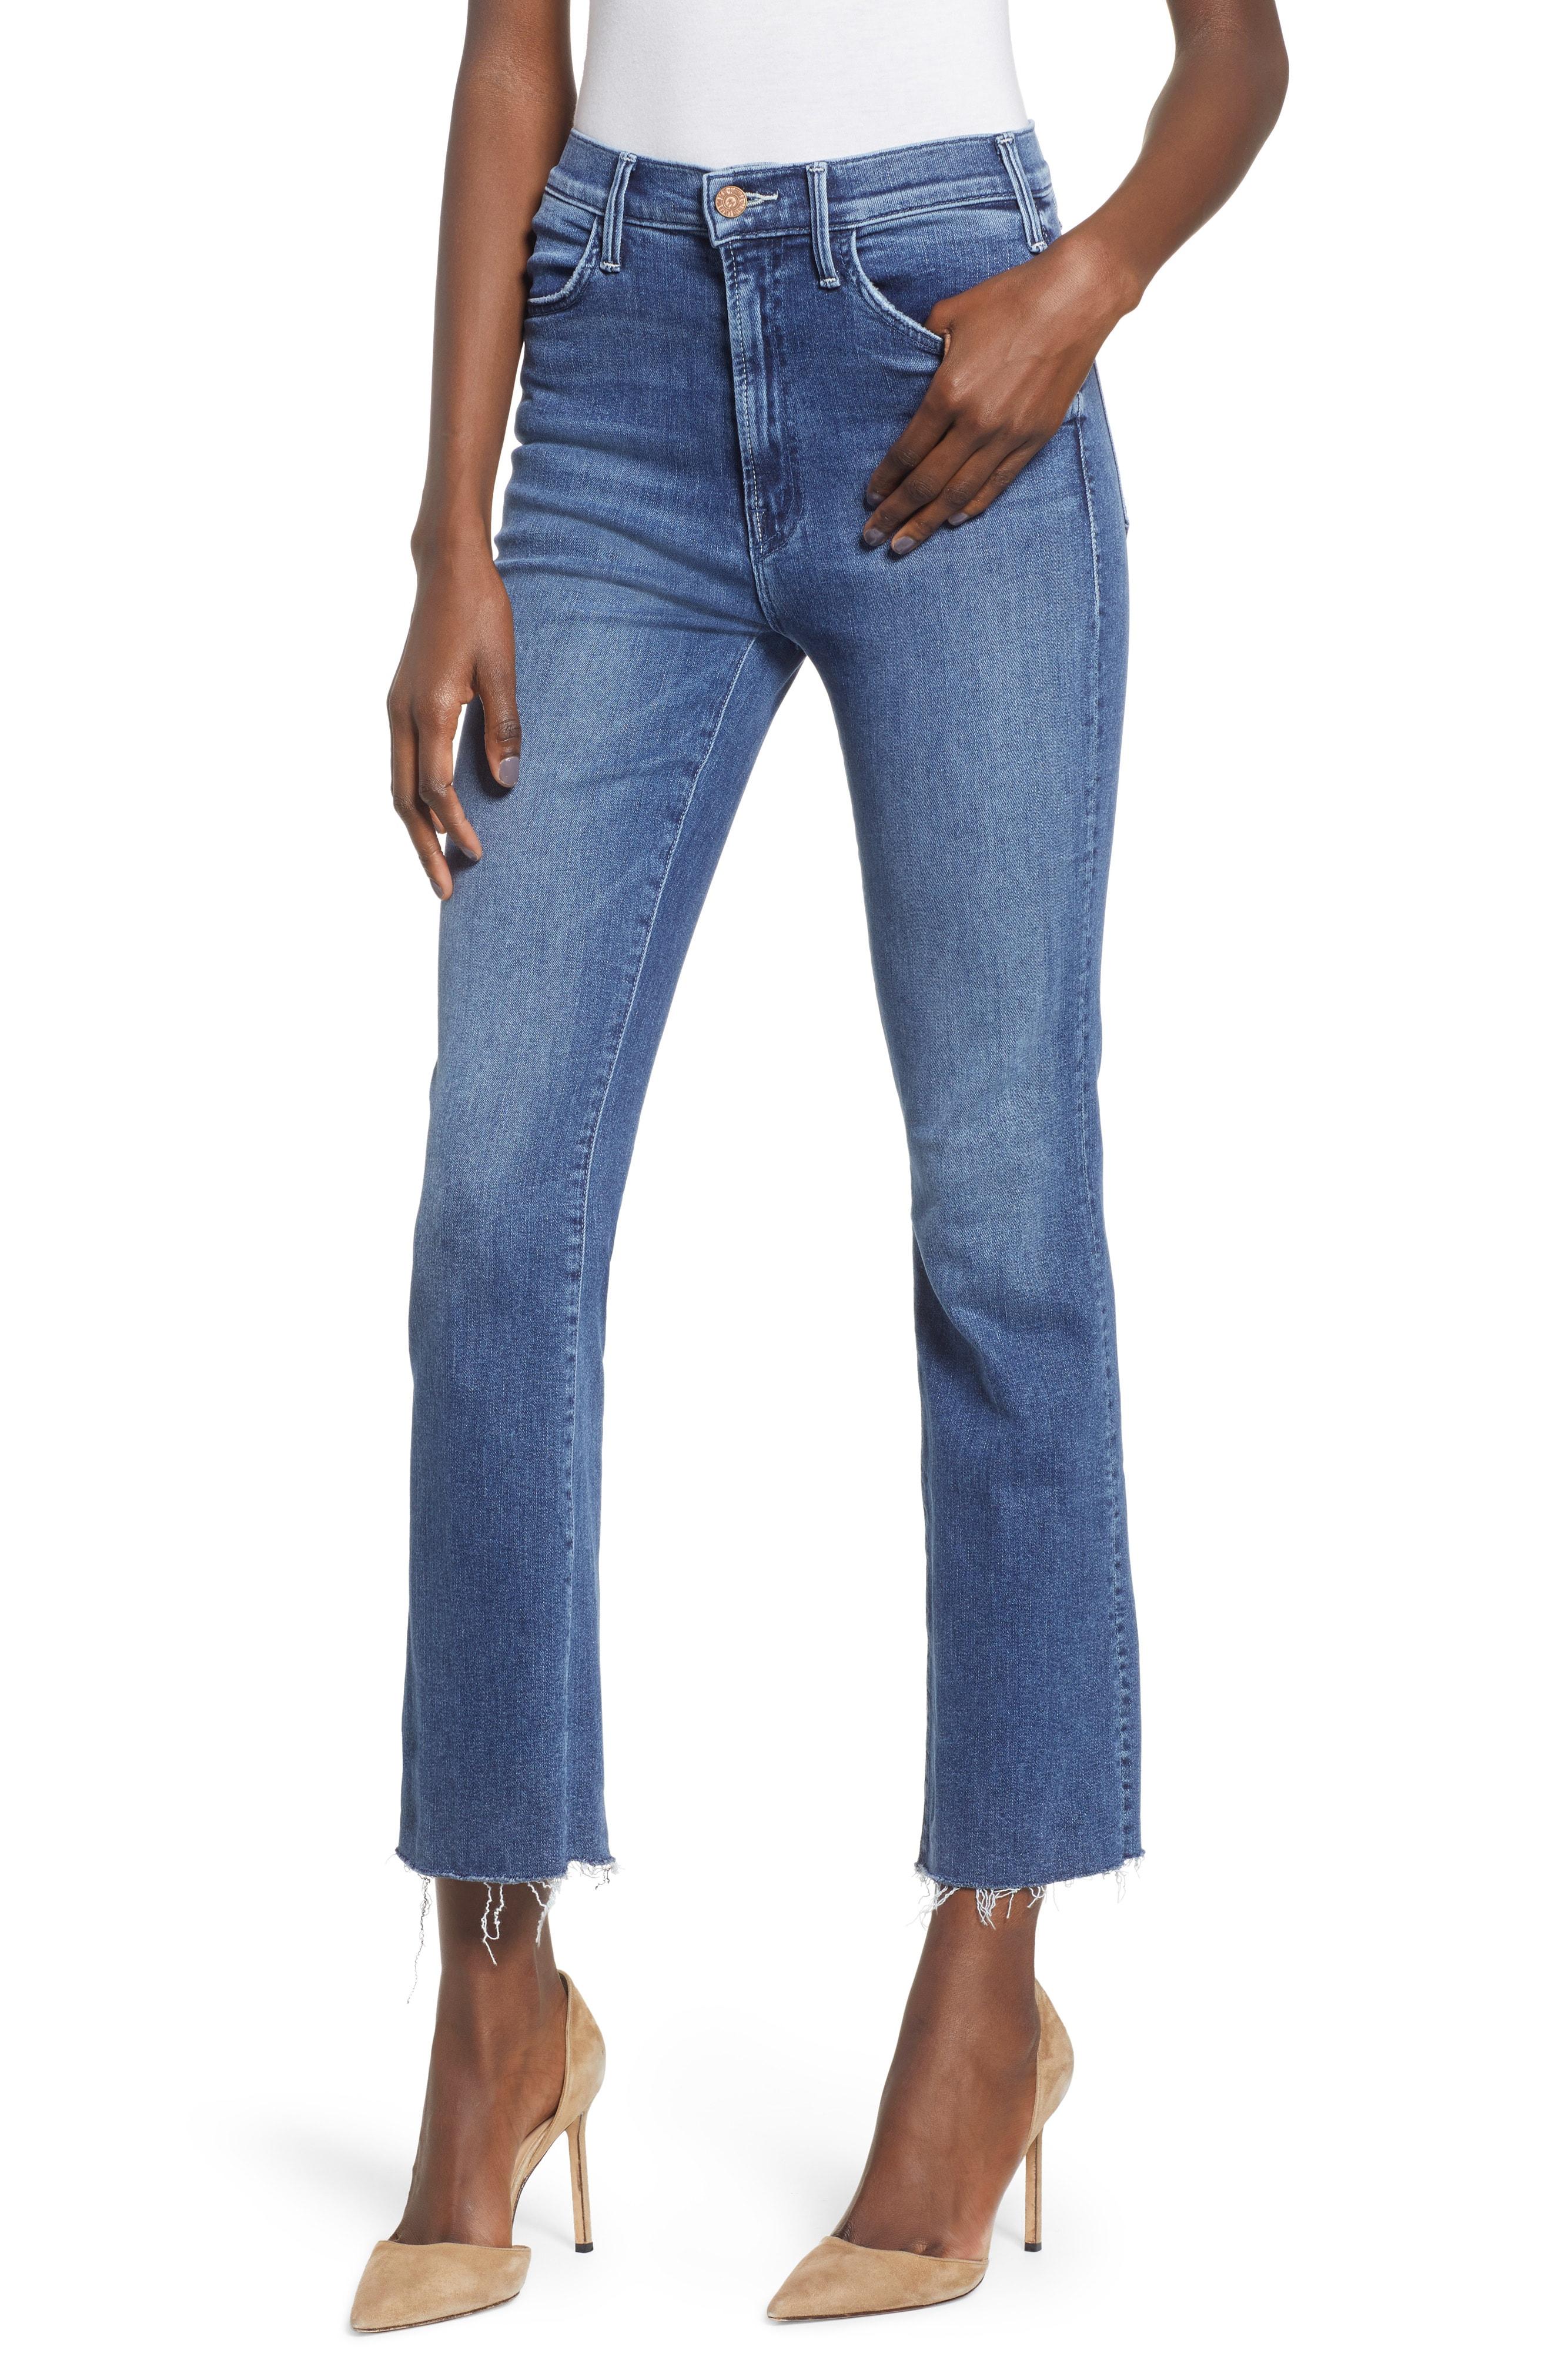 MOTHER The Hustler Fray Ankle Bootcut Jeans (Bake Sale Brawl)